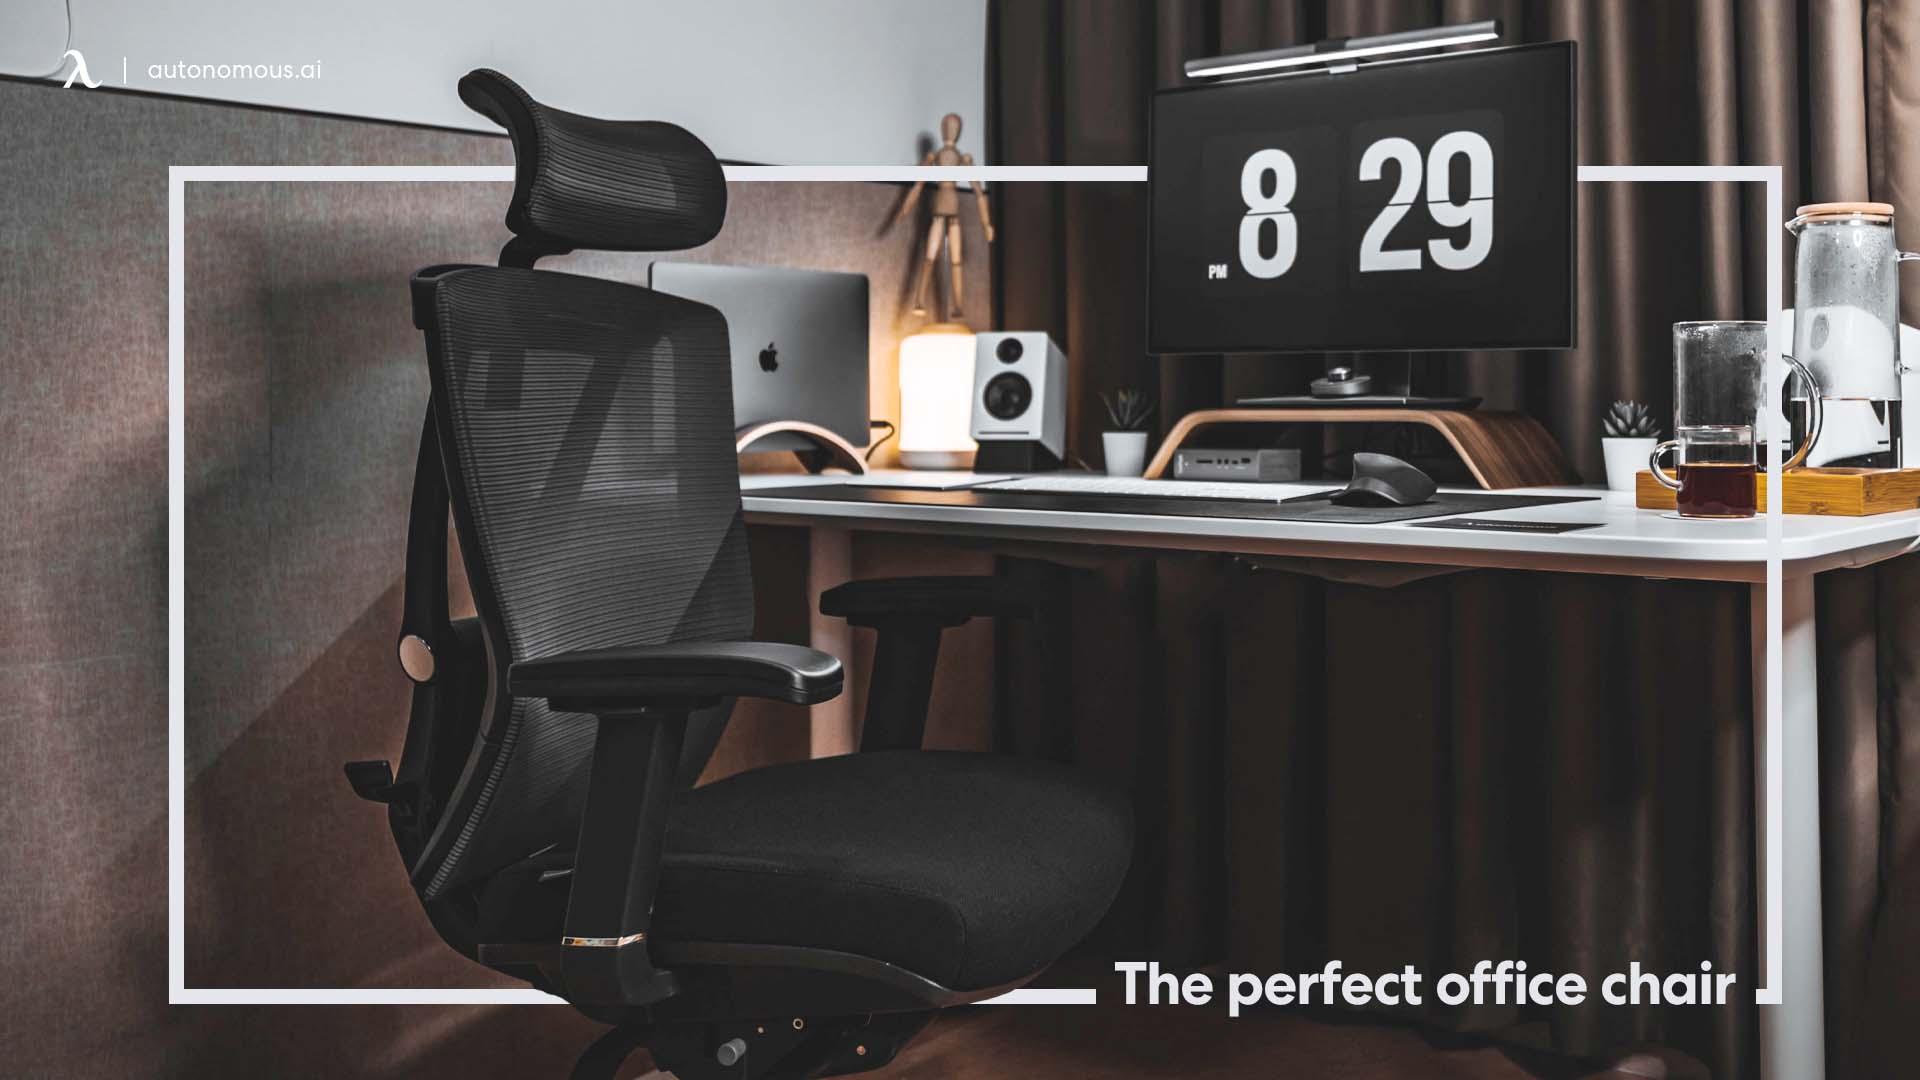 Standing dedsk & ergonomic chair for Productivity